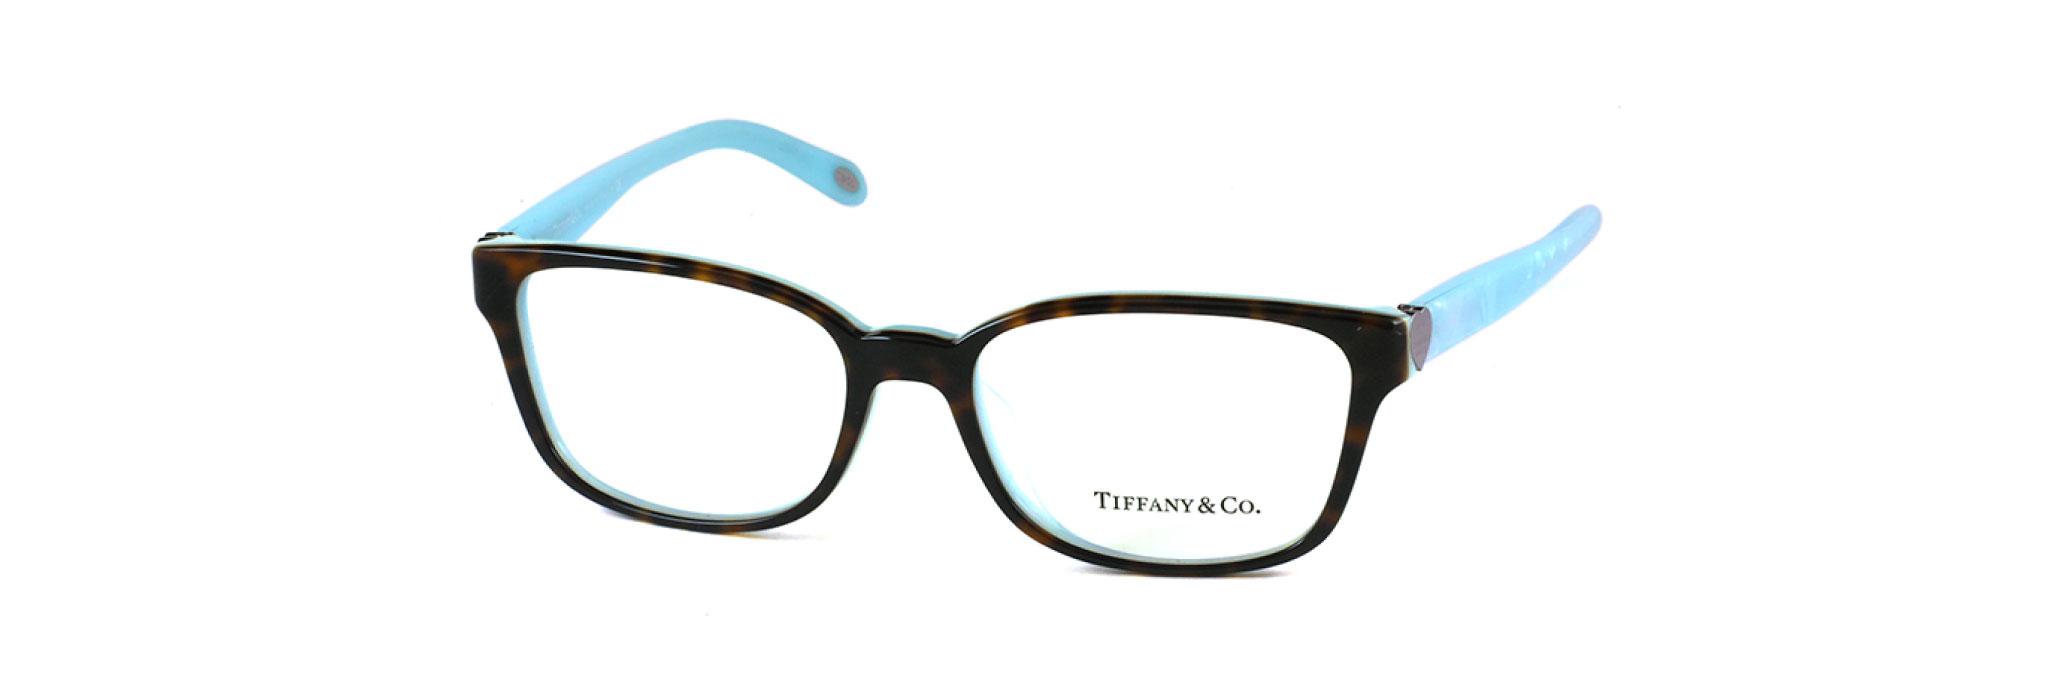 Tiffany Frames - www.scottsdaleeye.com